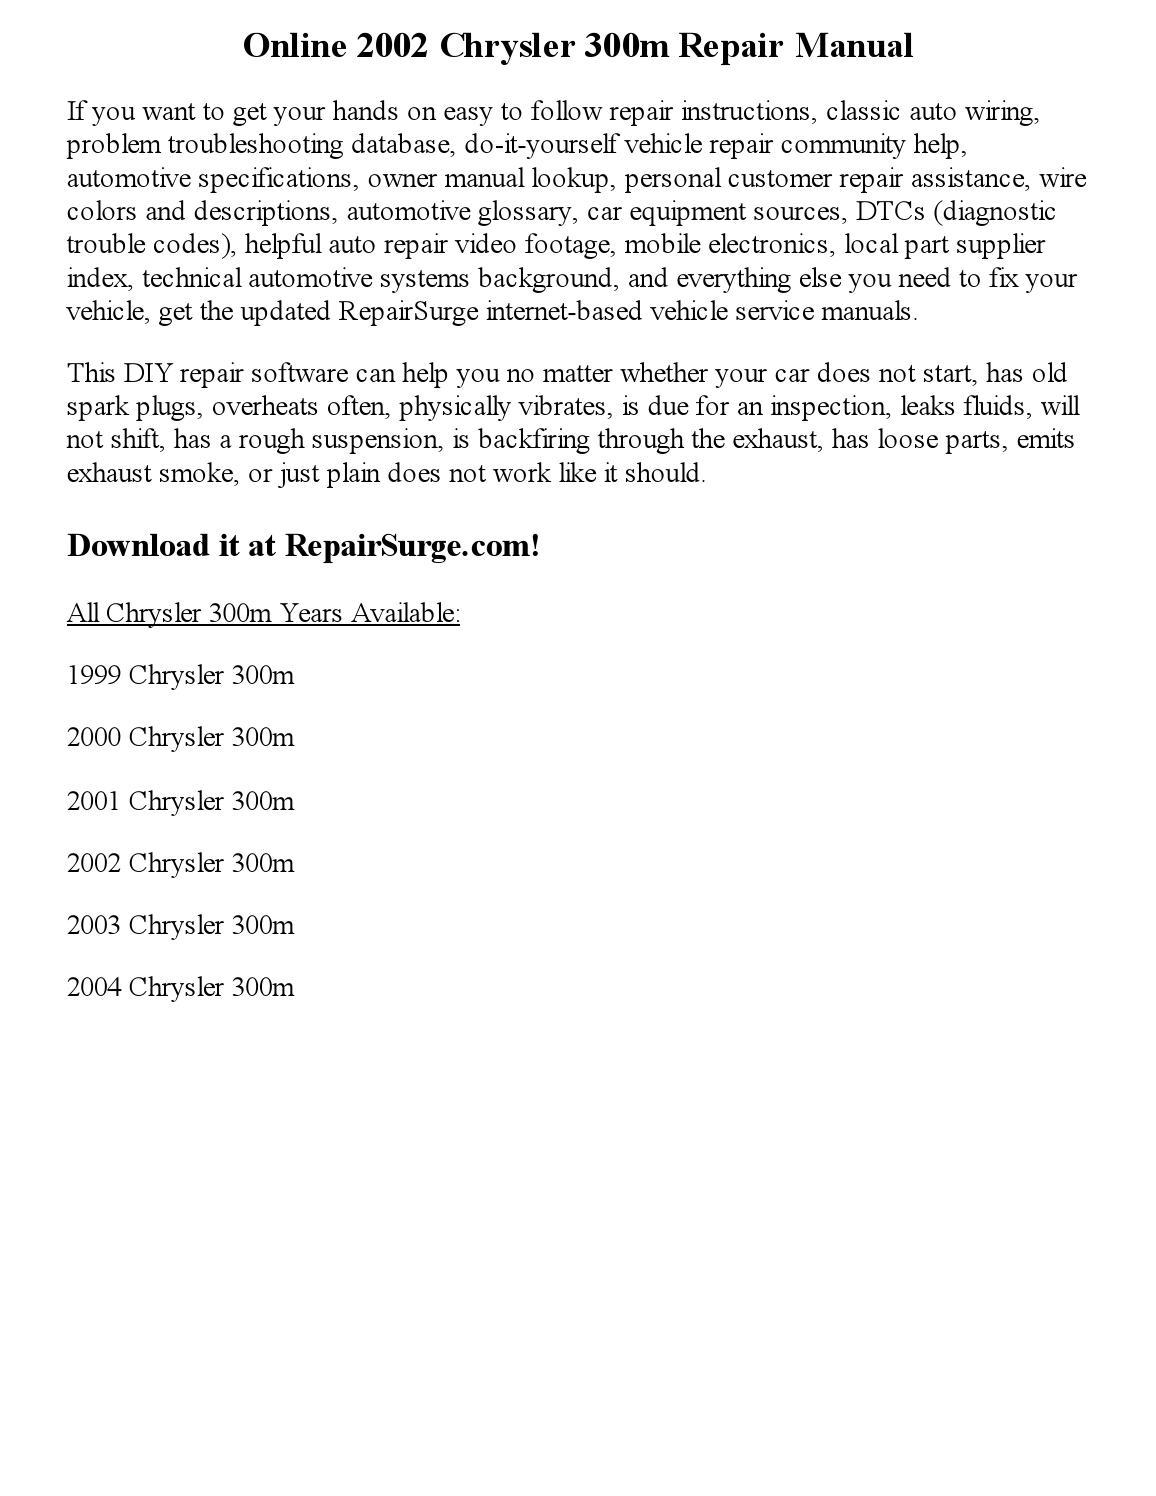 hight resolution of 2002 chrysler 300m repair manual online